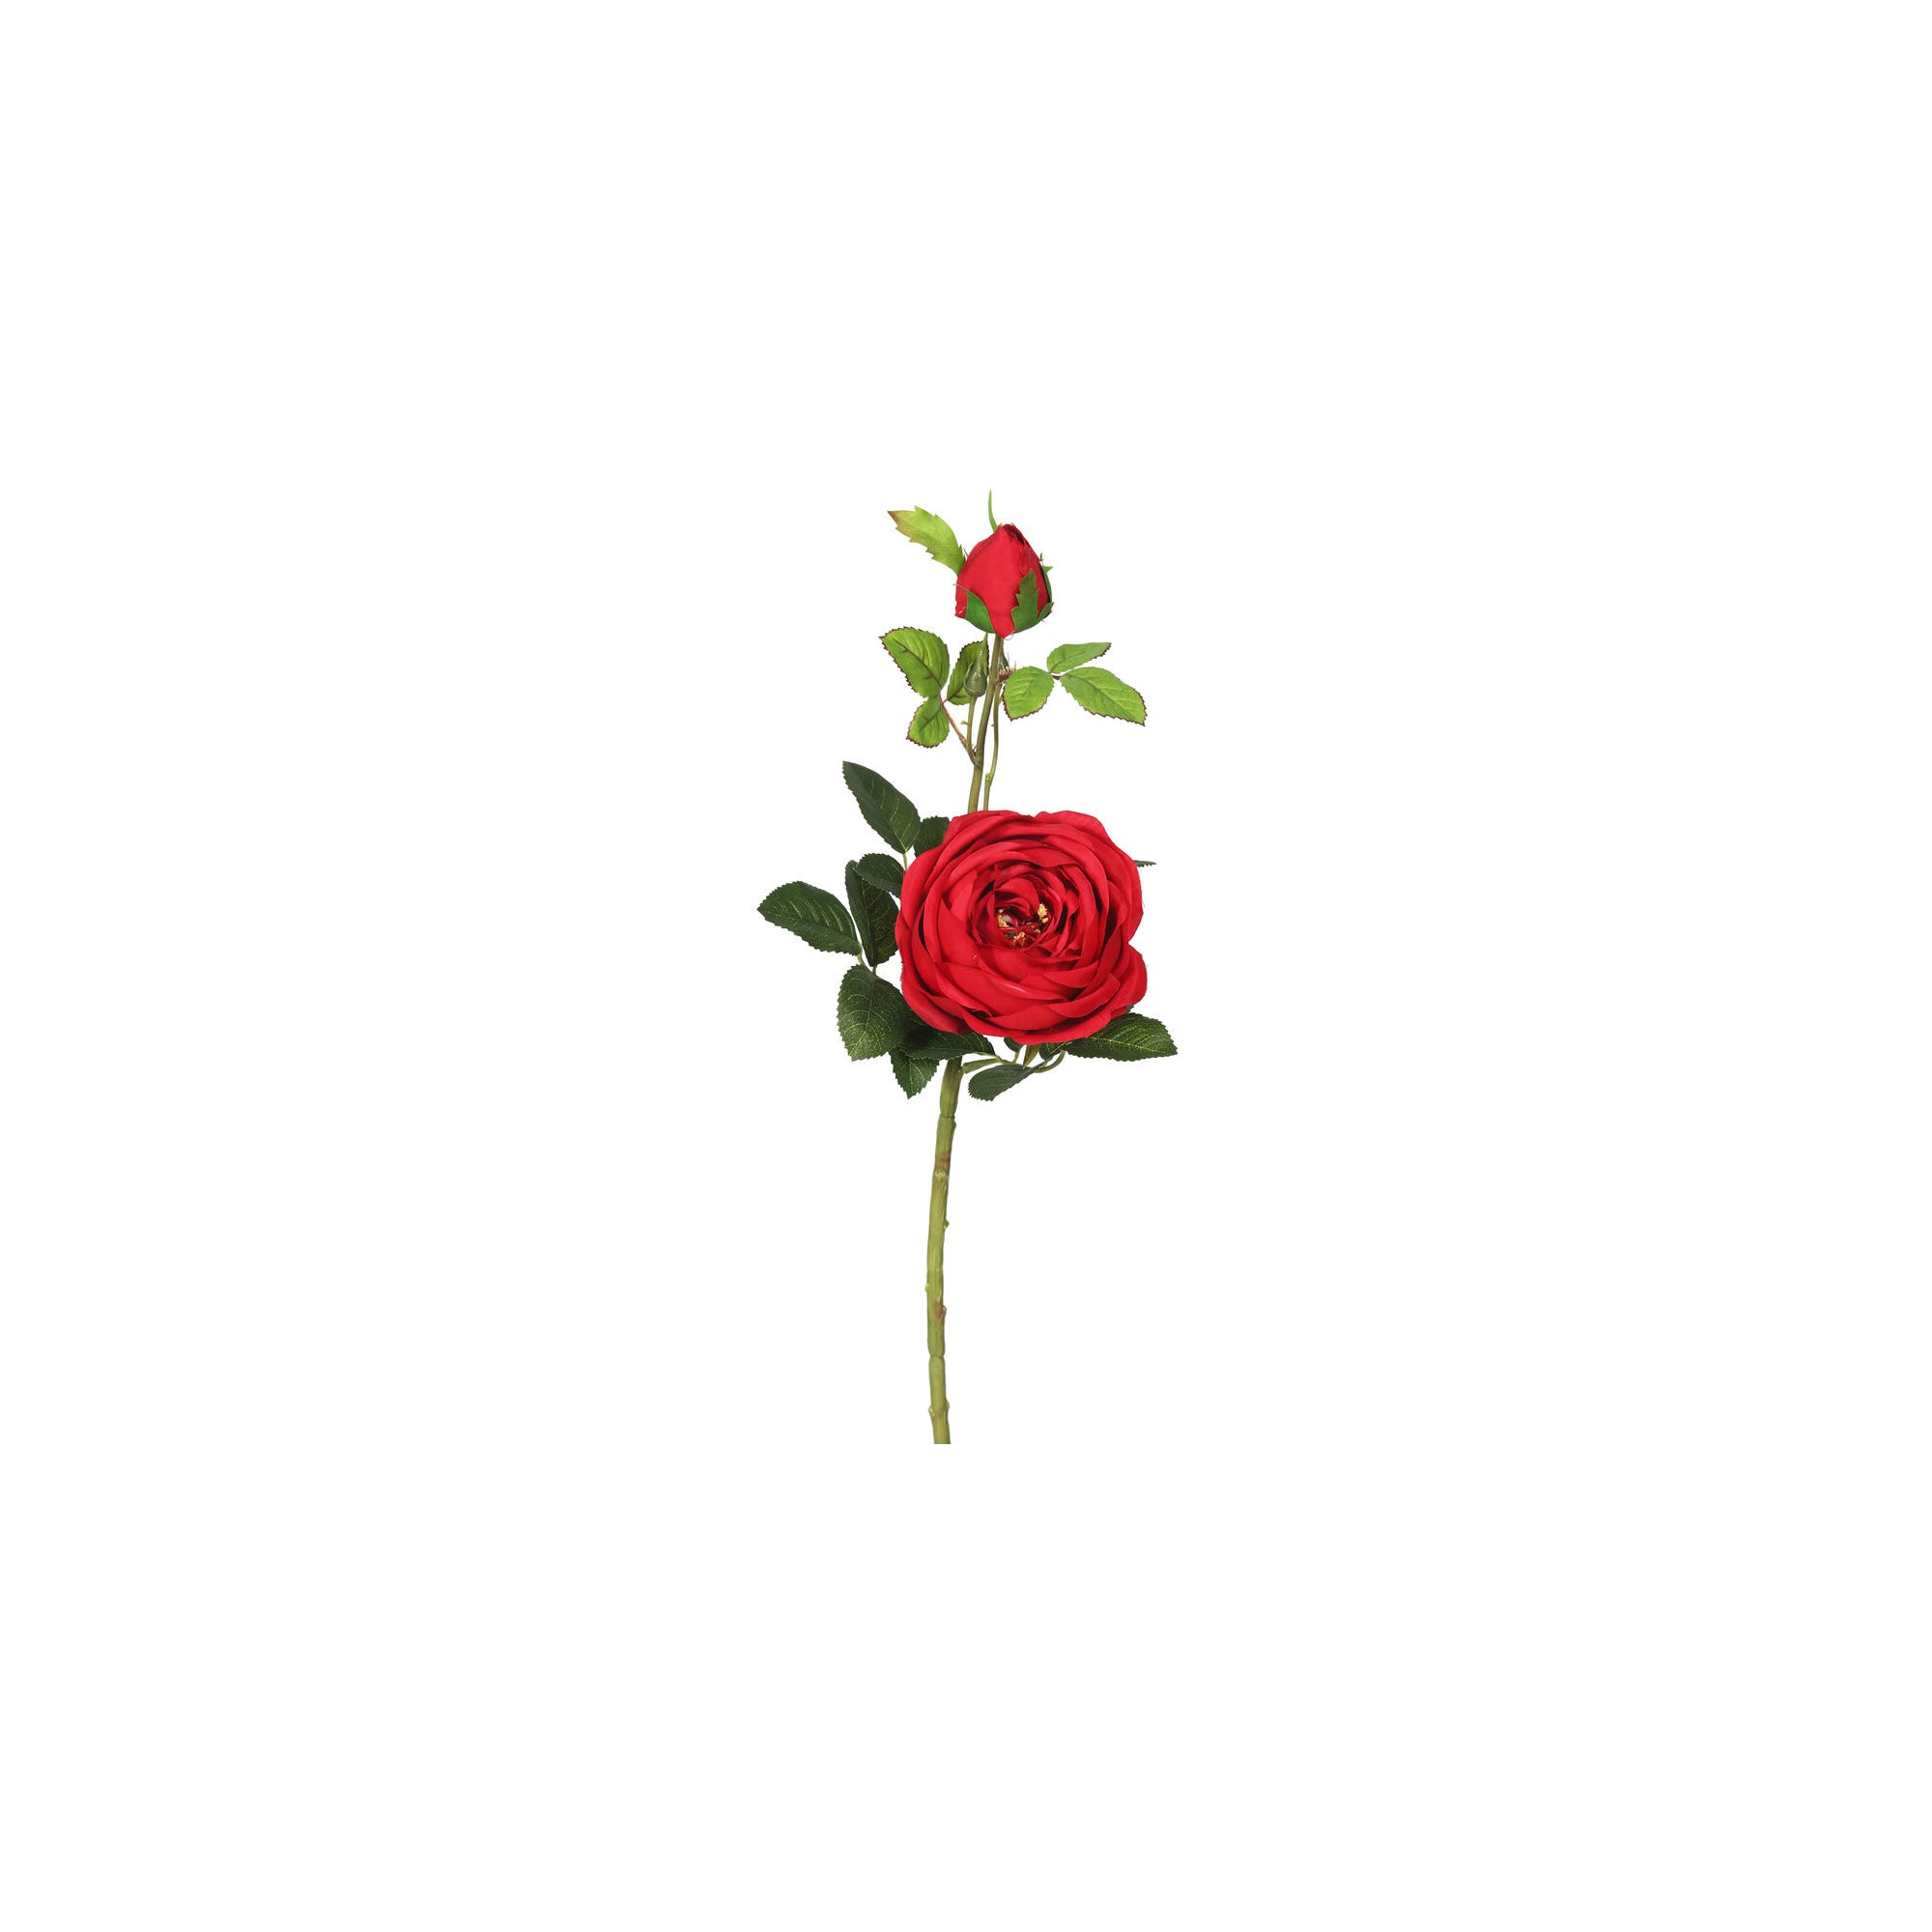 8606452b101c78120bb550f4783c7745 » Aesthetic Rose Drawing